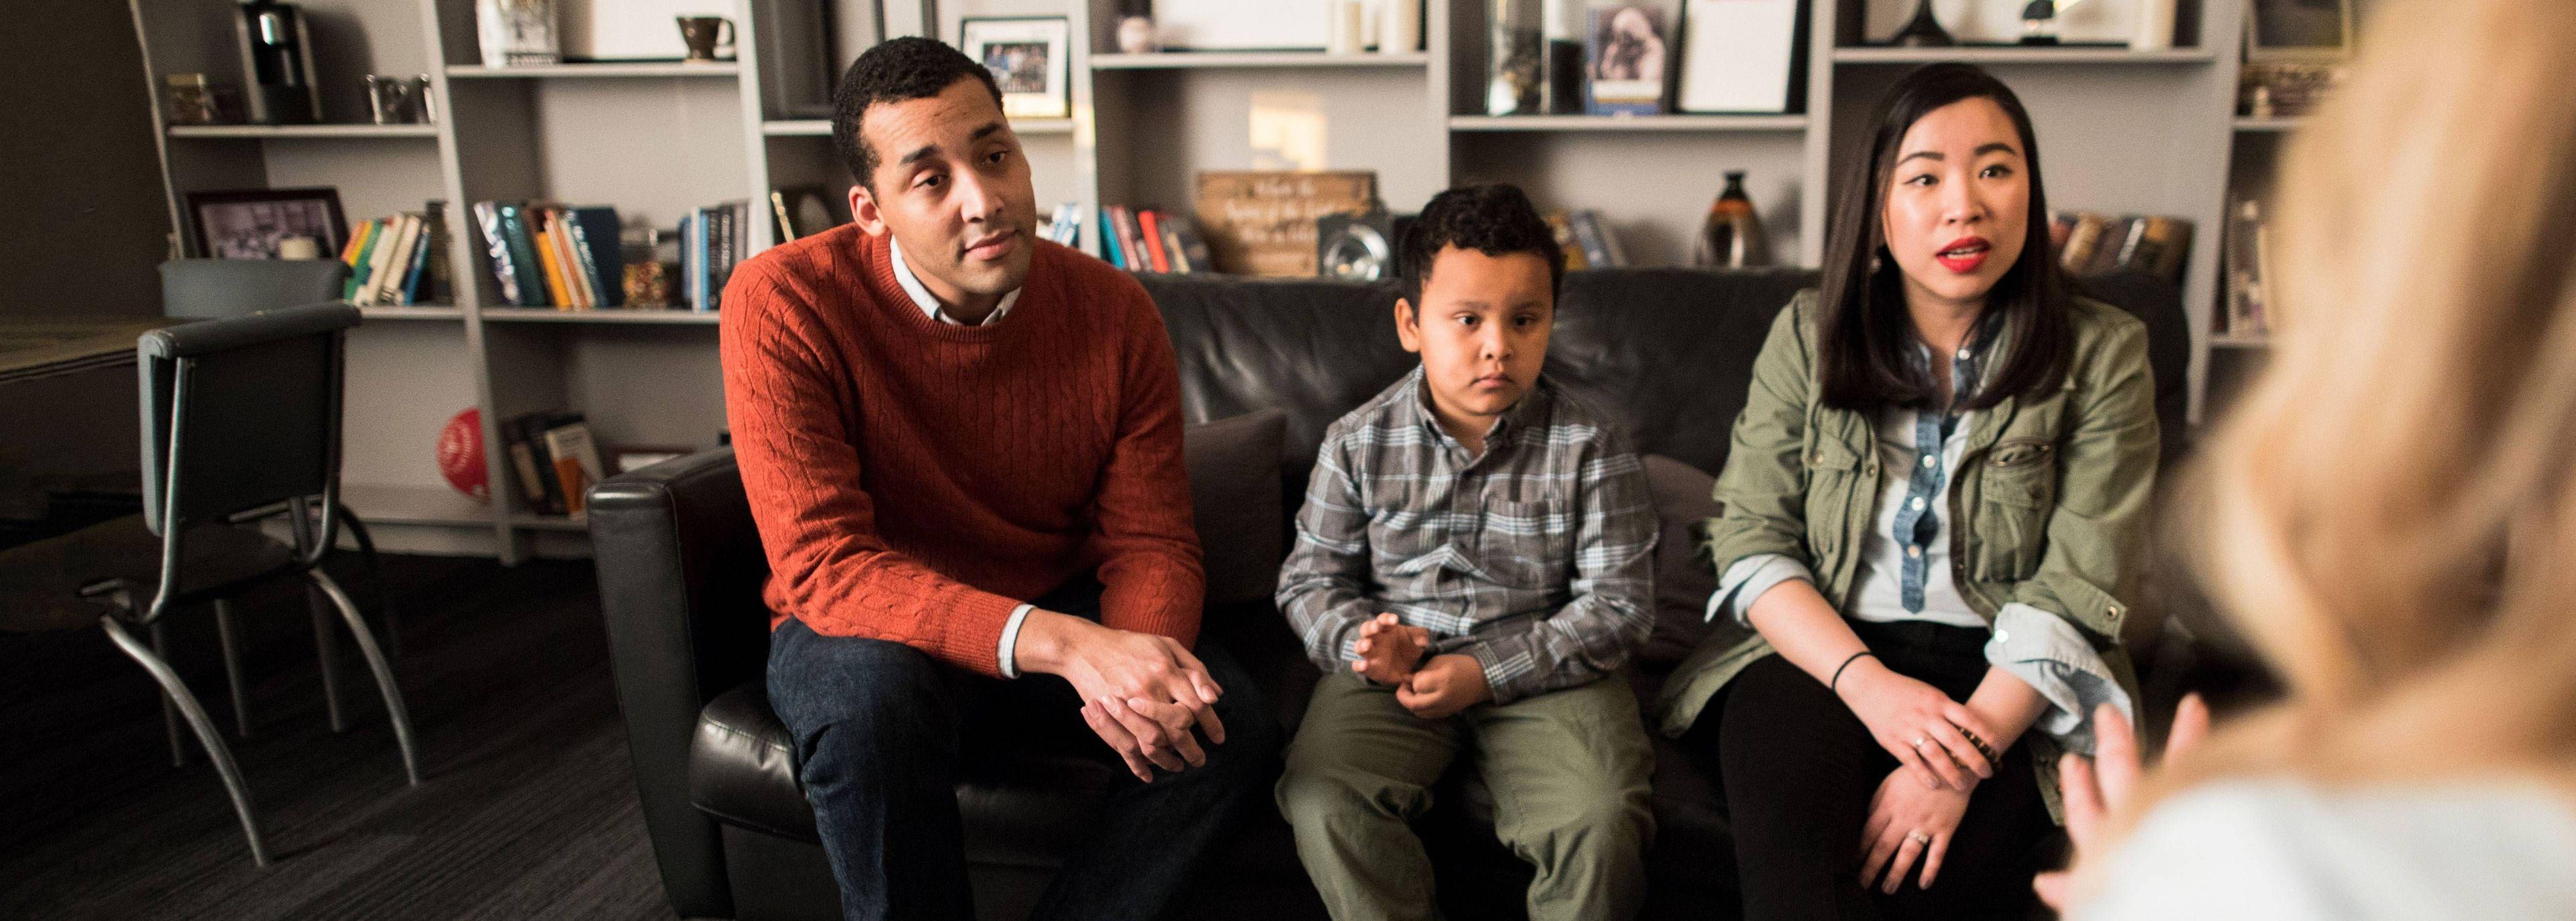 MA Human Service Family Advocacy